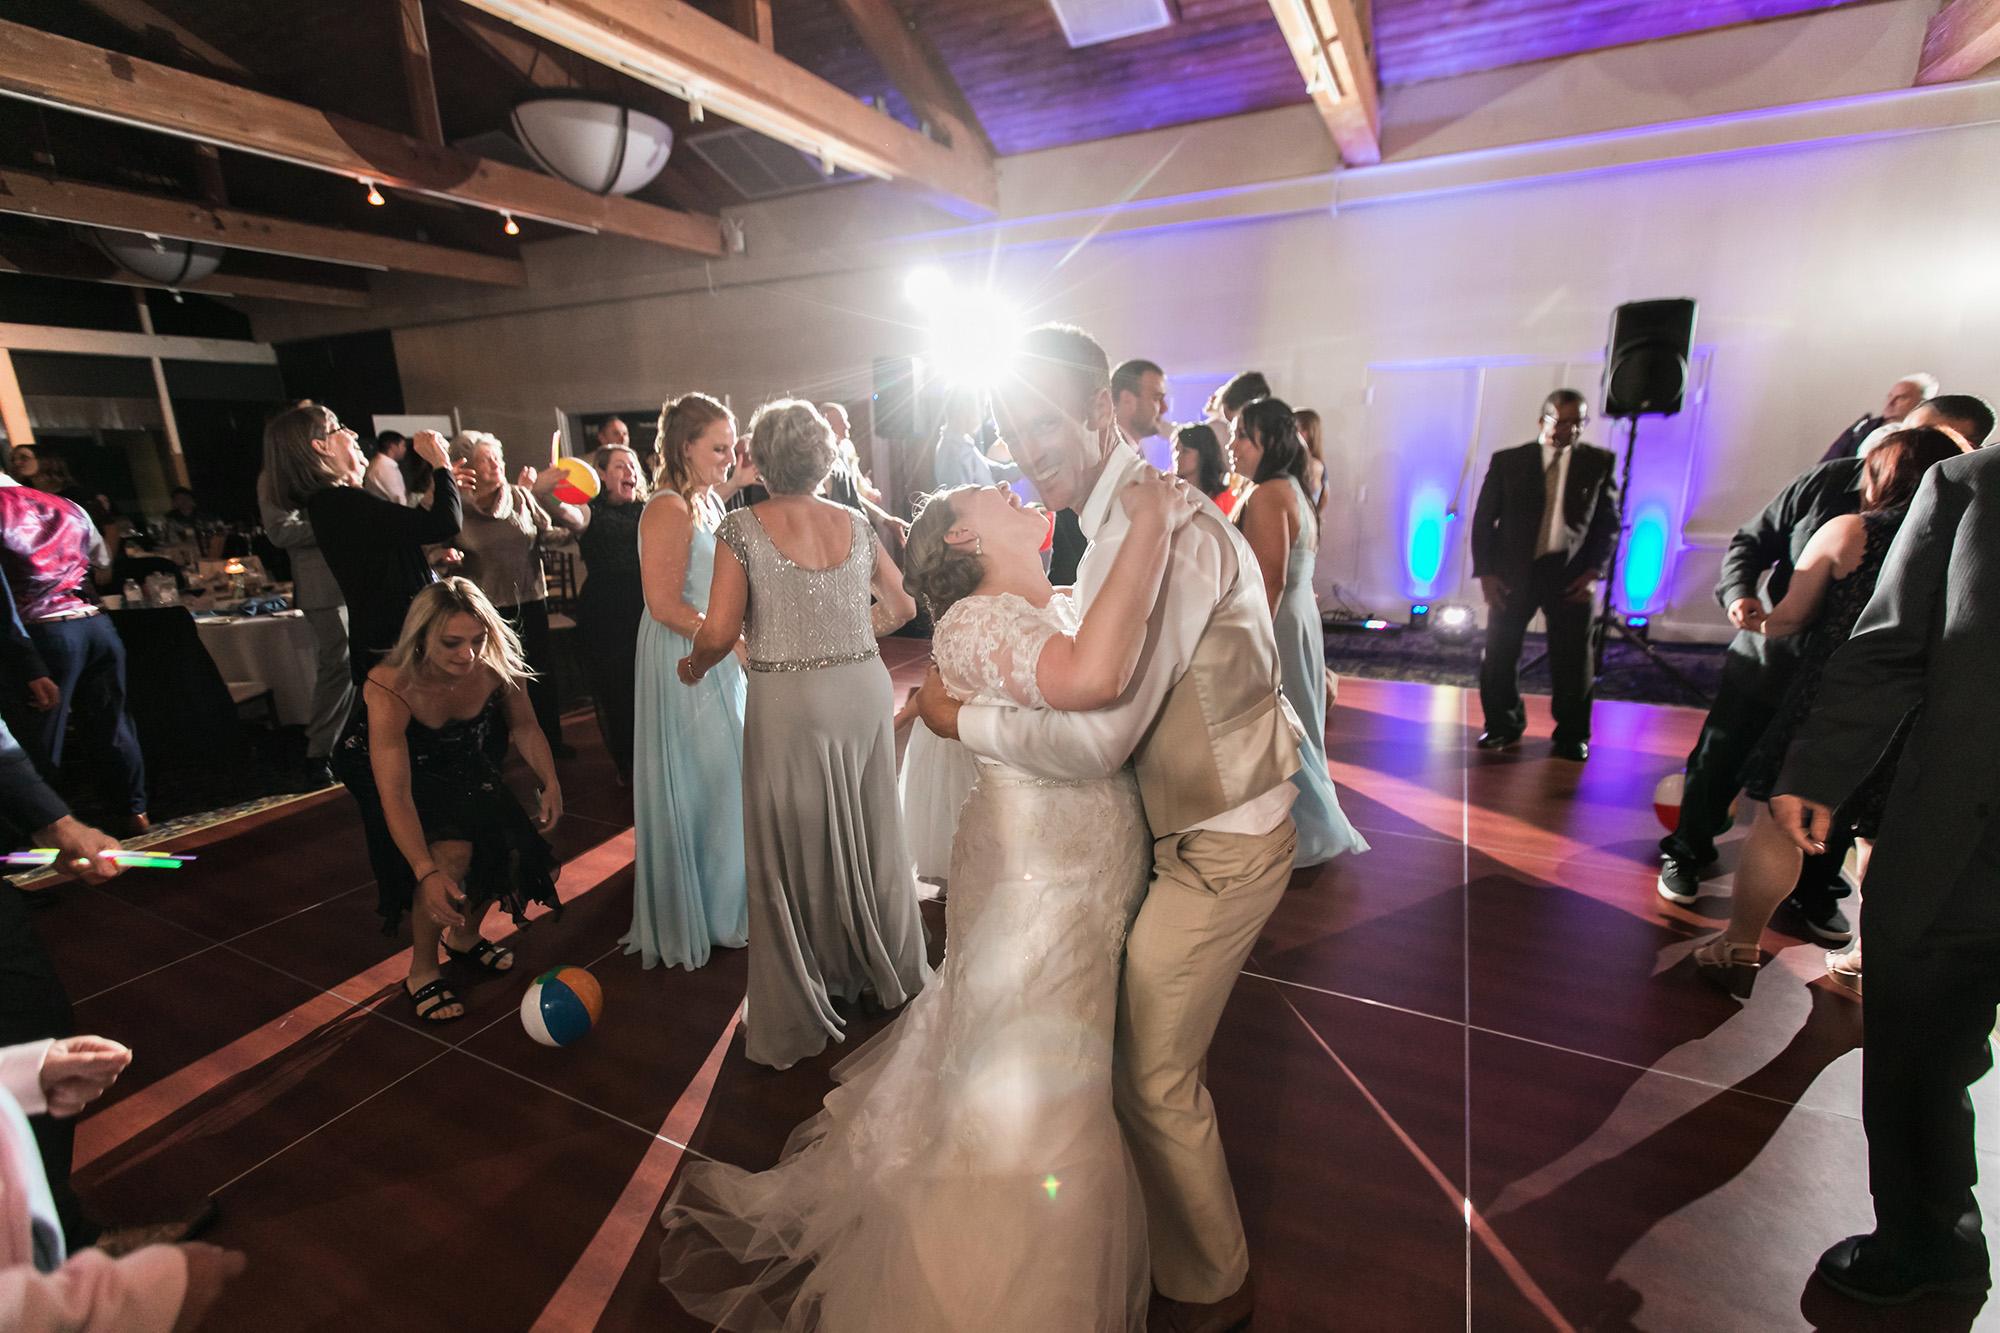 unforgettable-st-monica-wedding-carrie-vines-photography-130.jpg